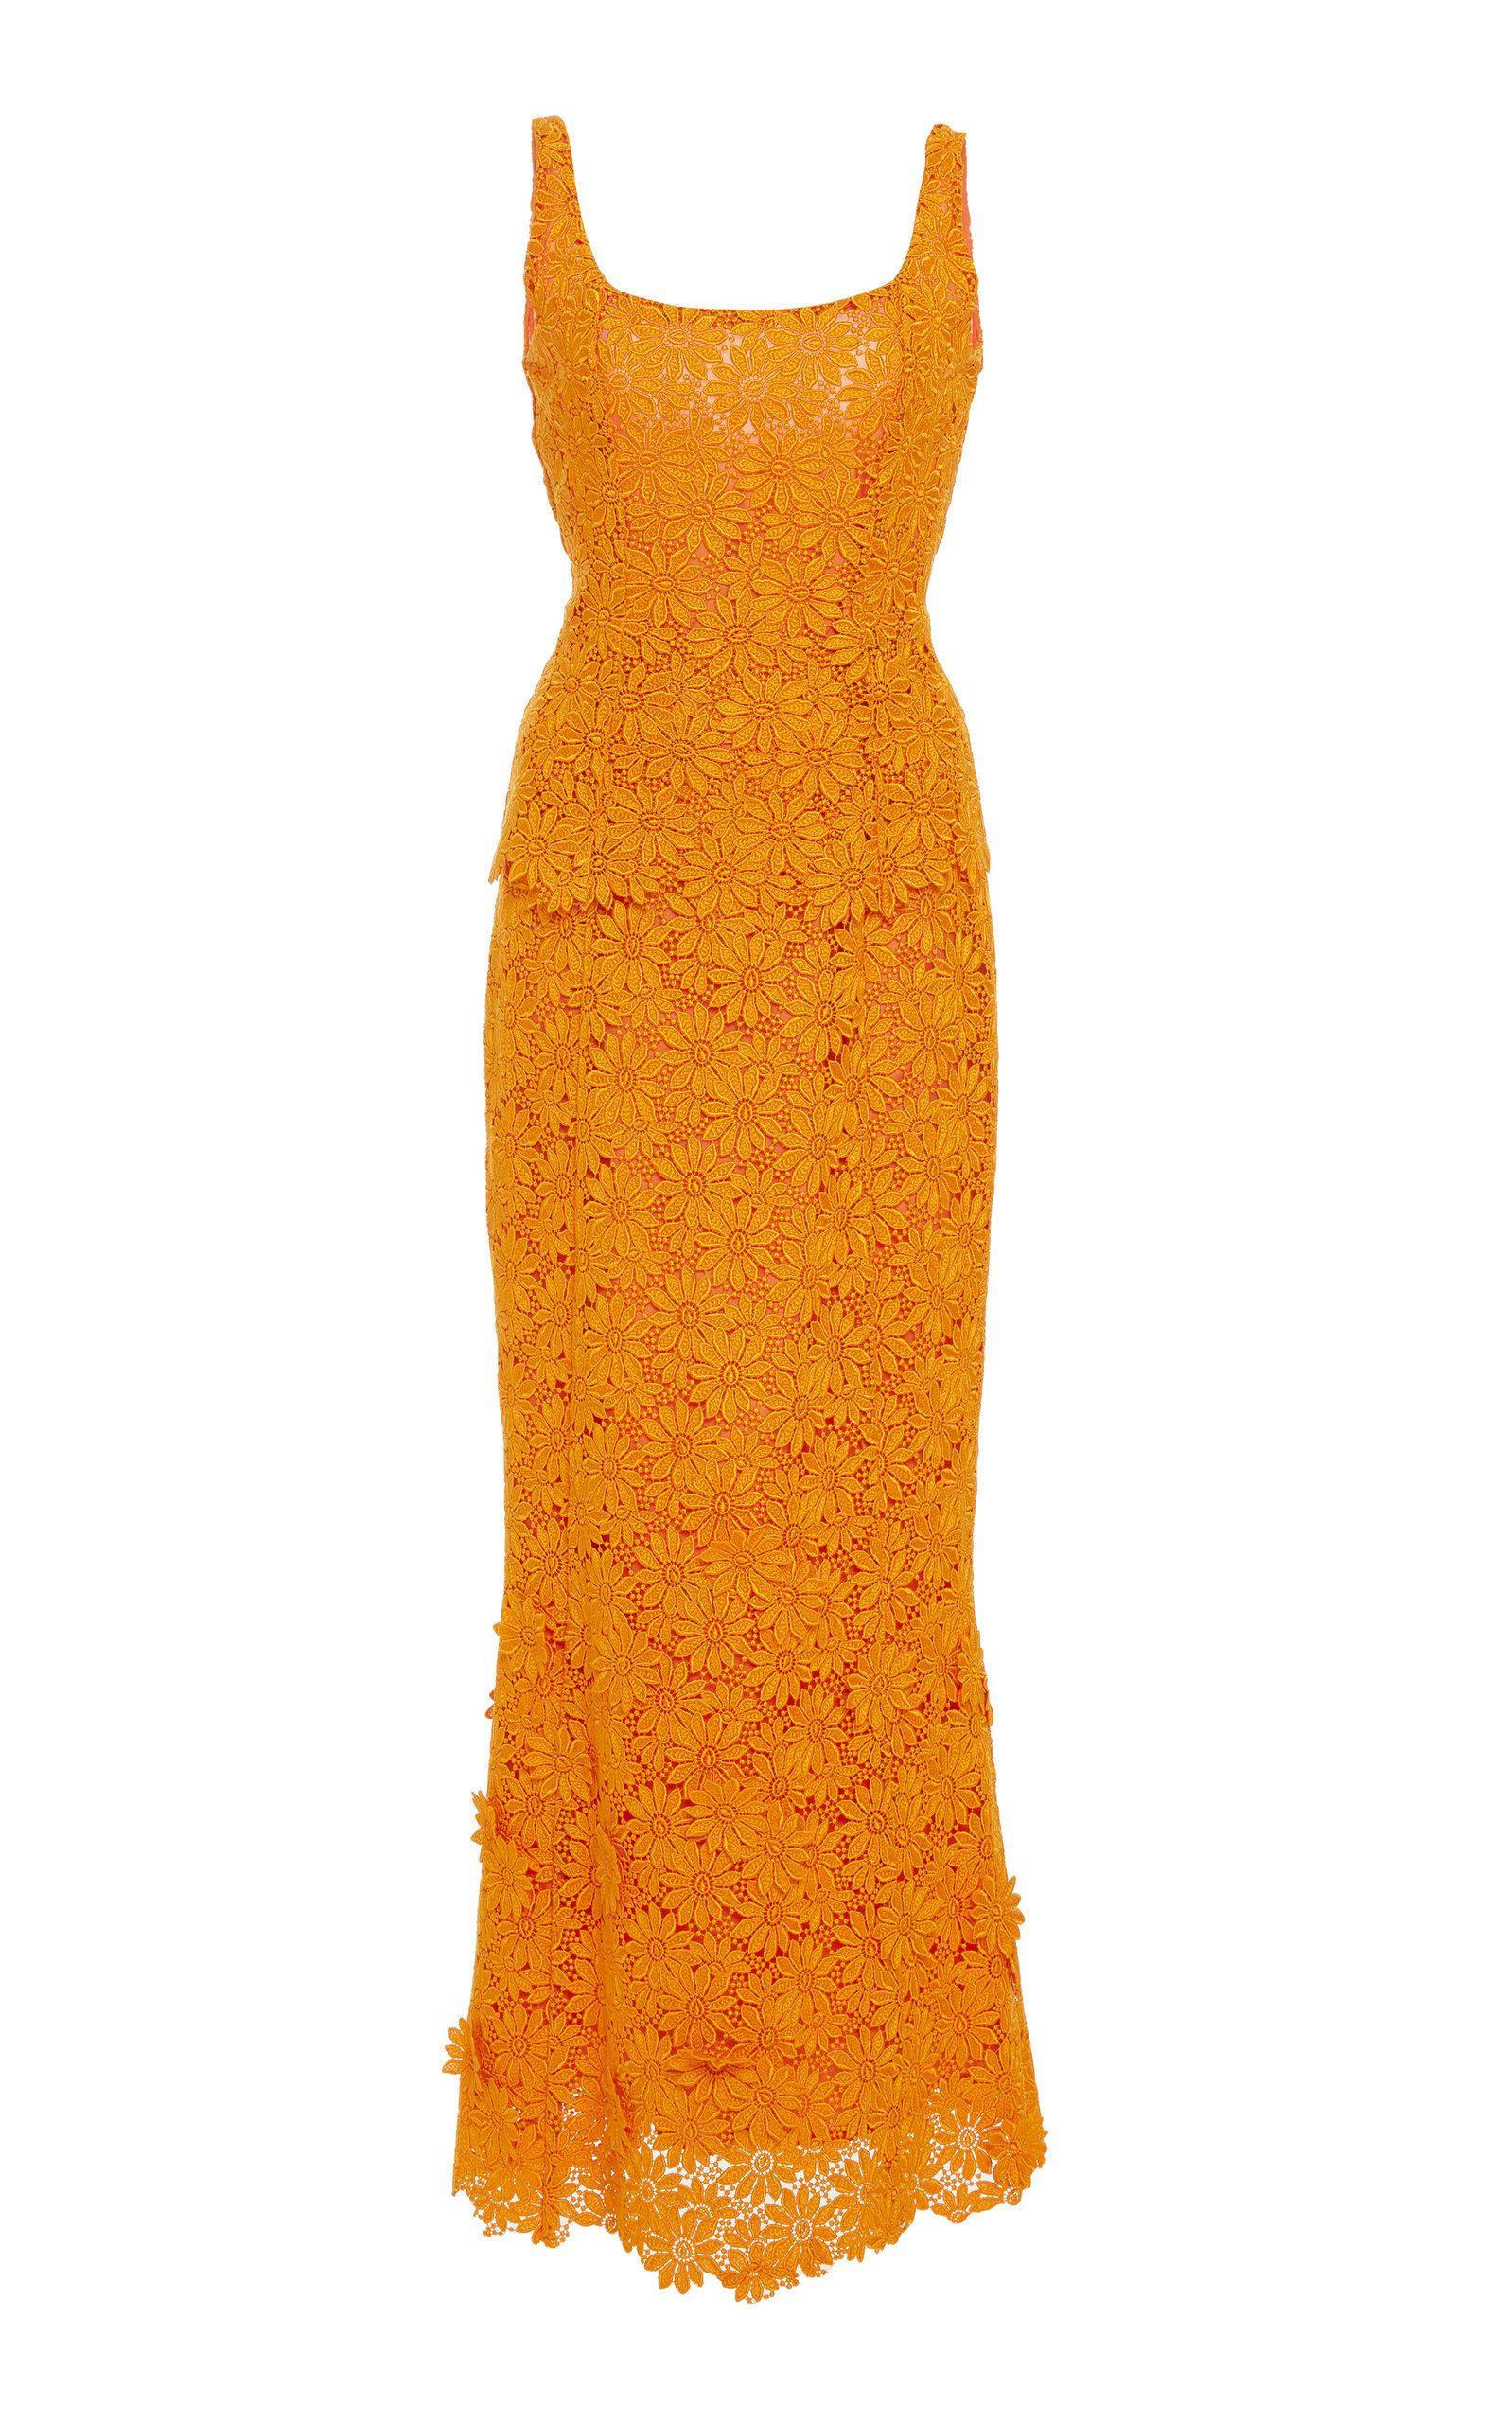 Romona keveza lace wedding dress october 2018 Penelope Sleeveless Guipure Lace Dress in   art  Pinterest